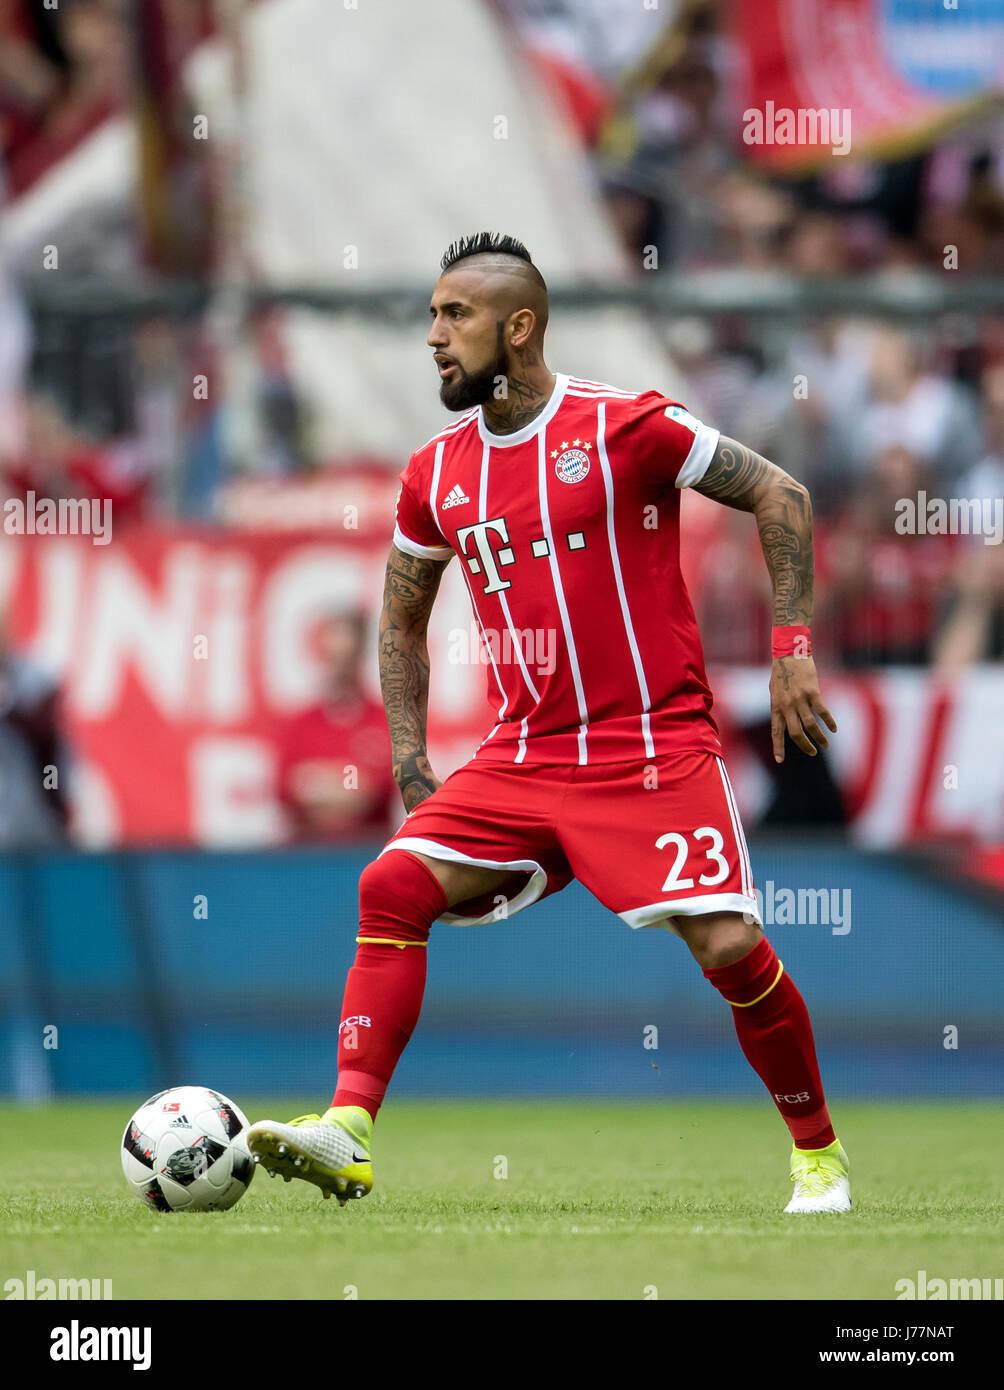 Munich s Arturo Vidal in action during the German Bundesliga